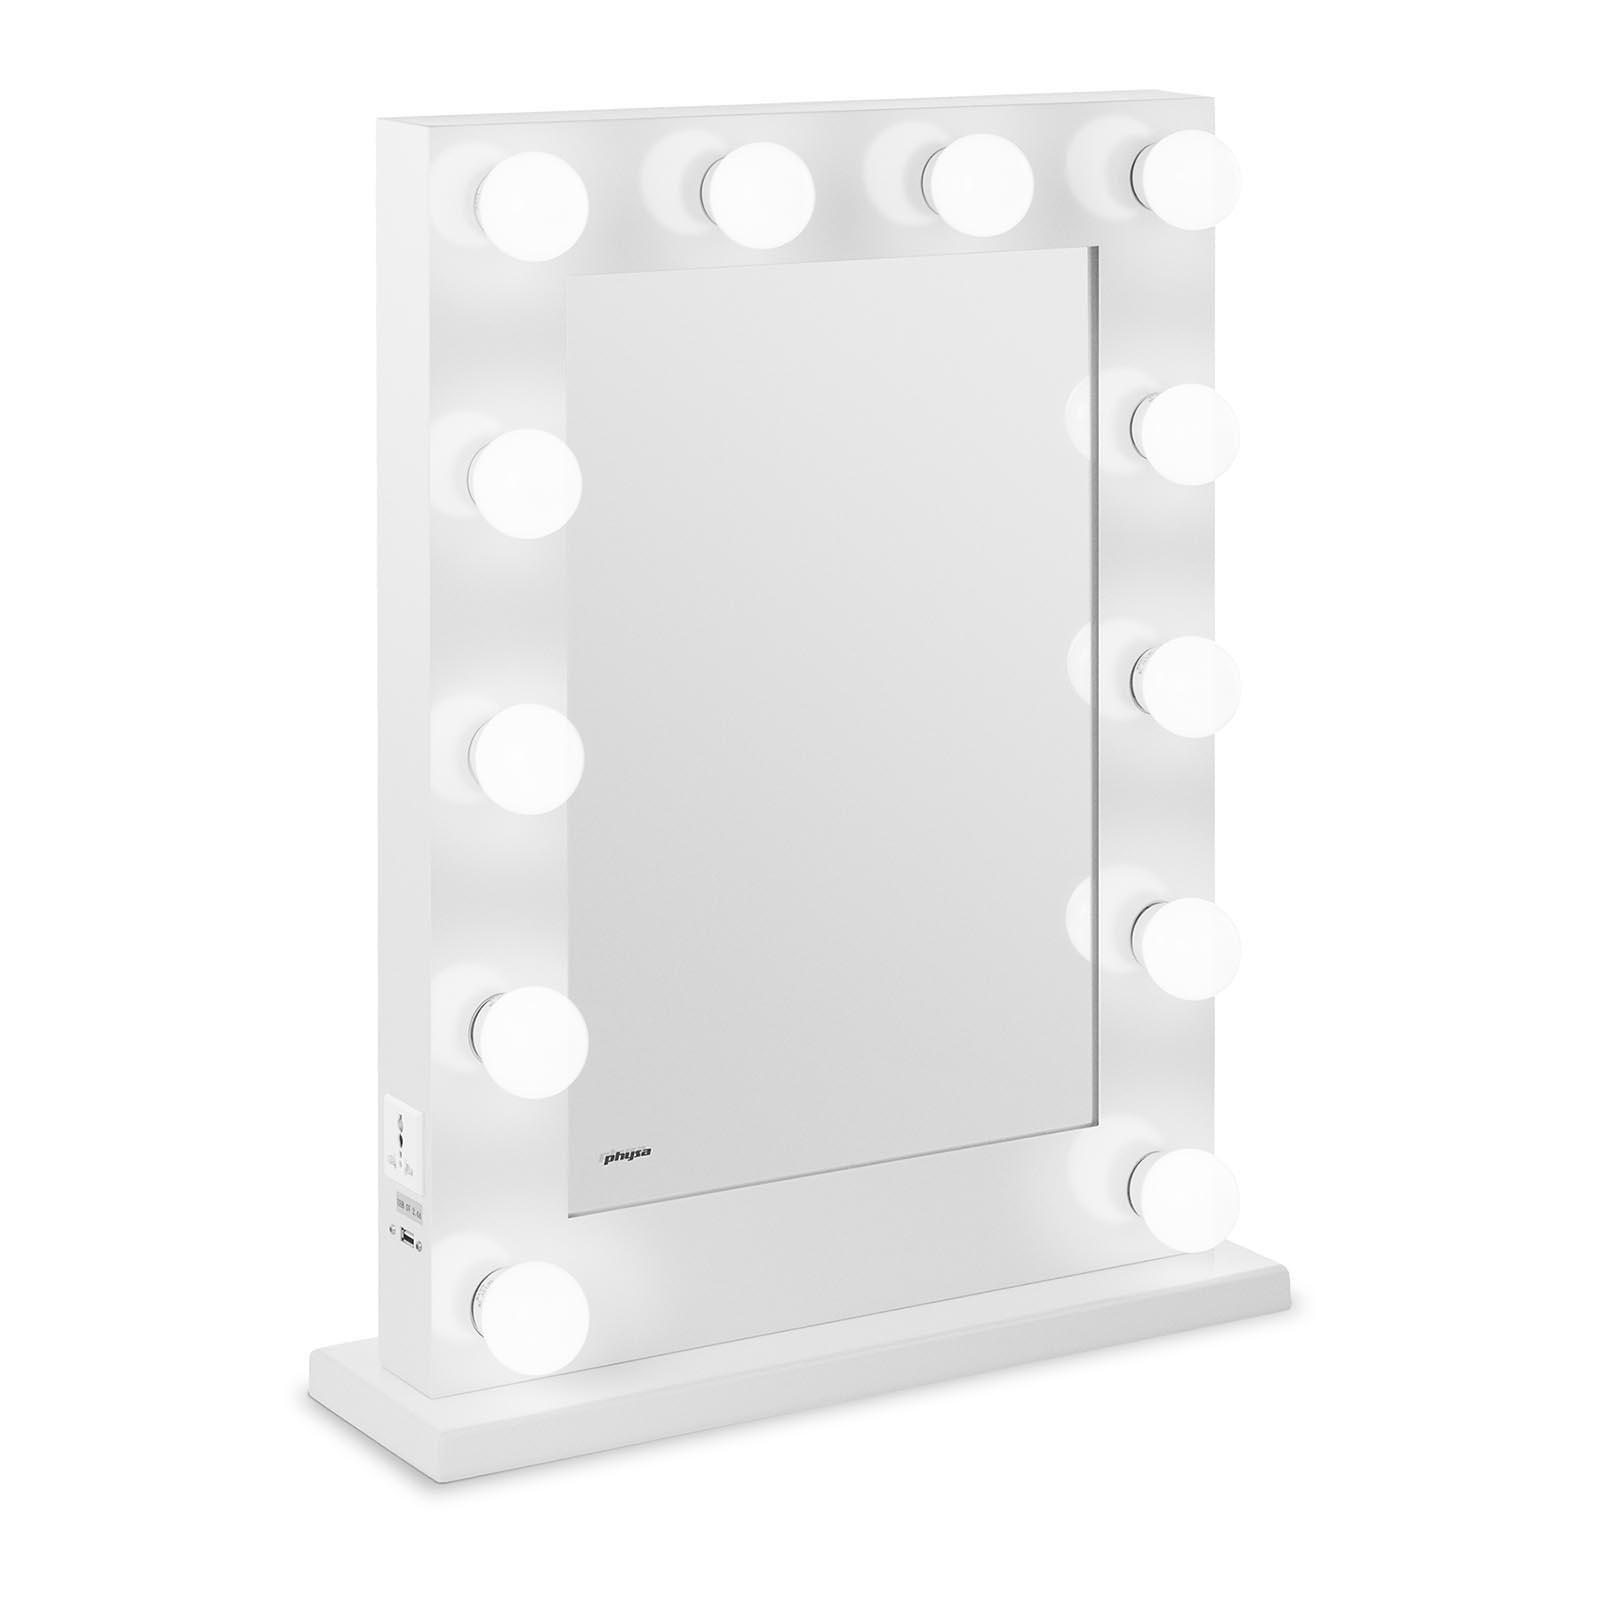 Lustro z żarówkami - LED - biała rama - 65 x 50 cm